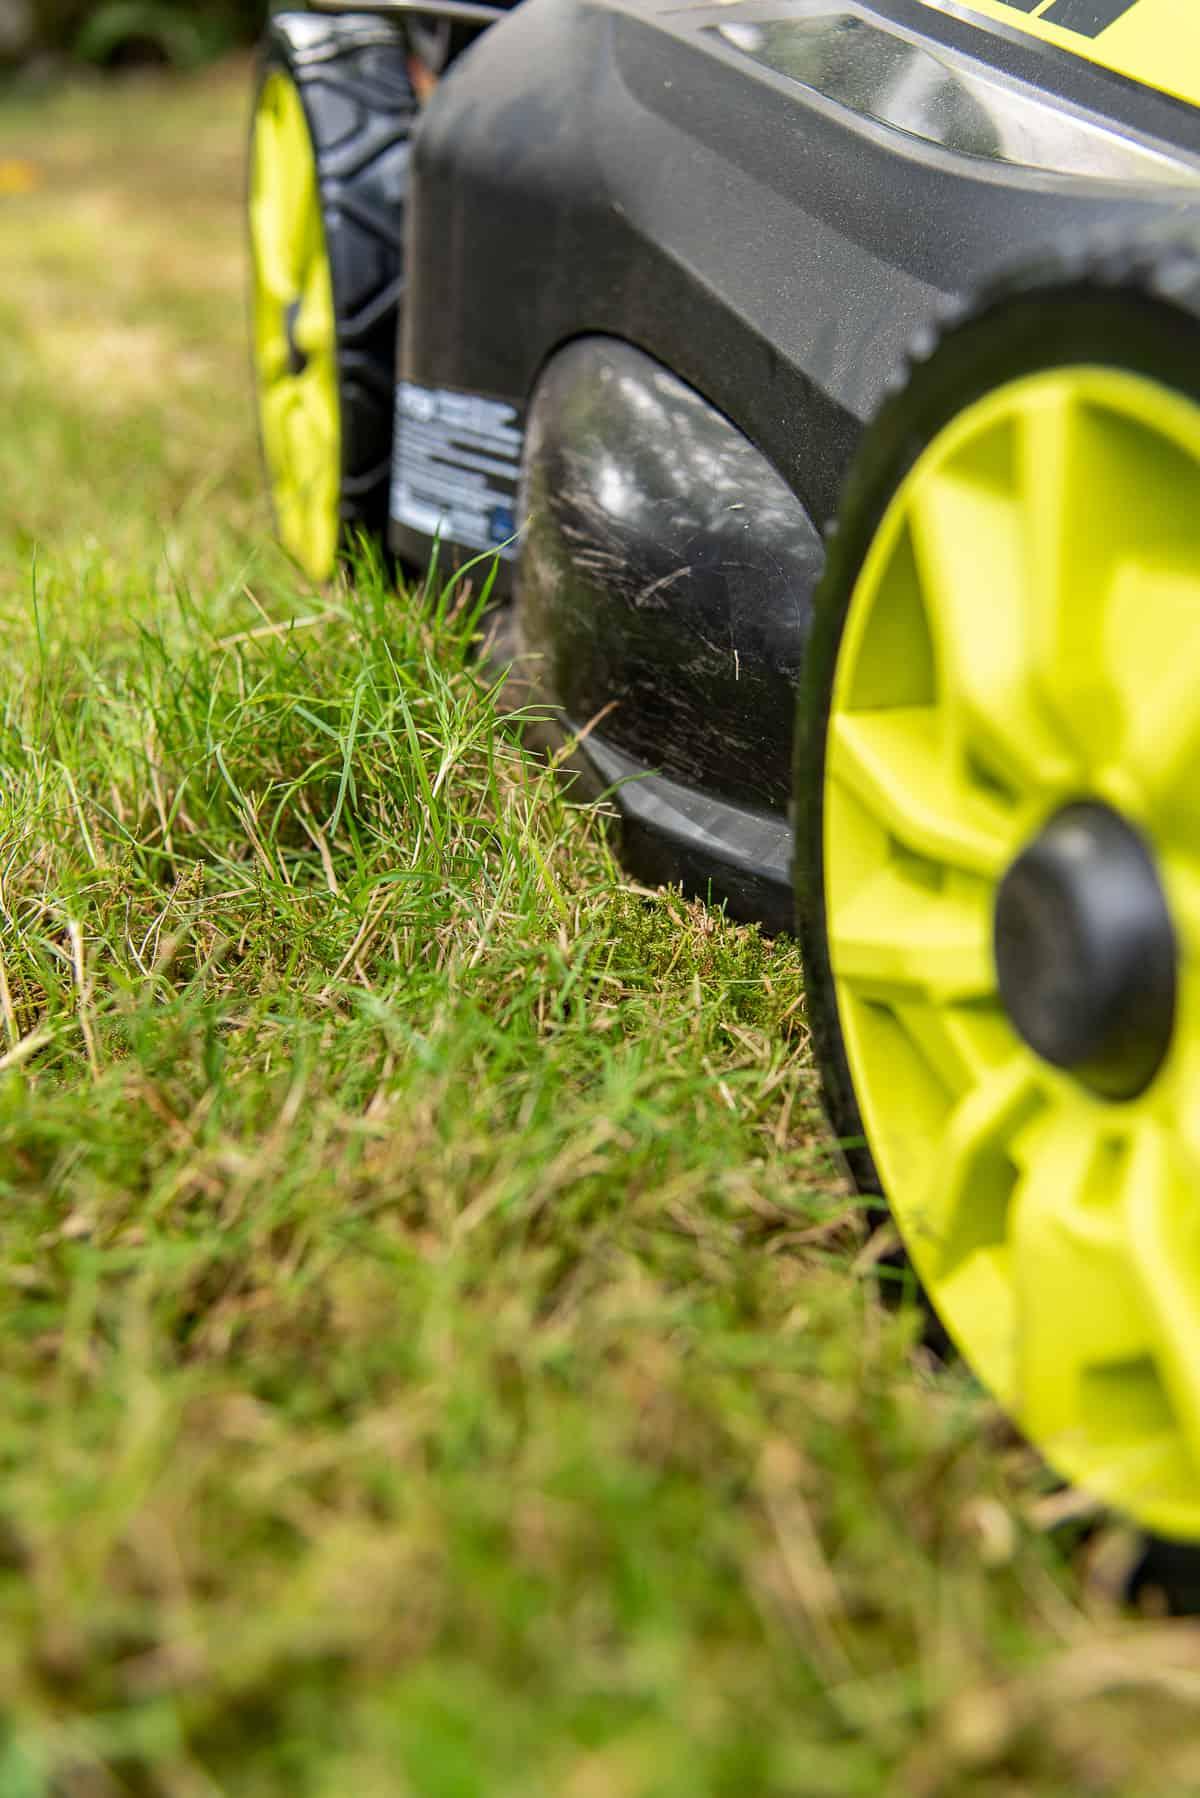 Ryobi self propelling electric lawn mower cutting tall grass